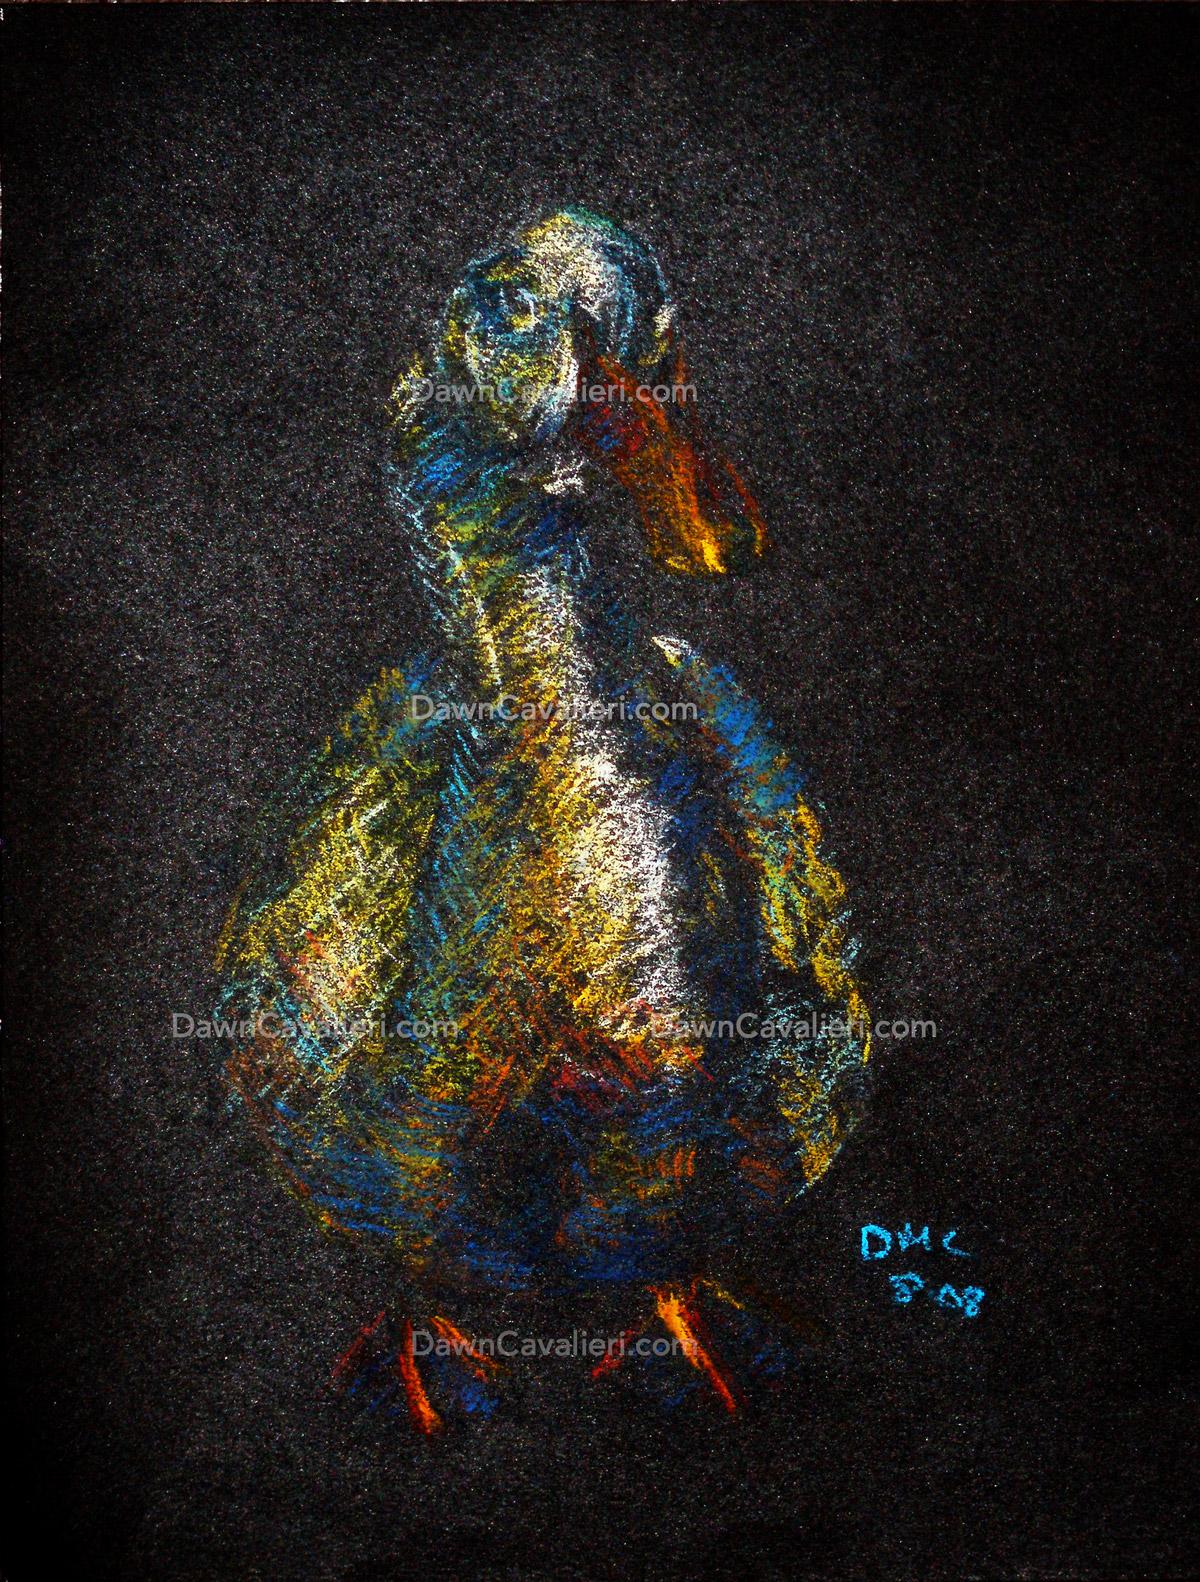 Pastel painting of Mr. Flapper, a pekin duck, by Dawn Cavalieri.